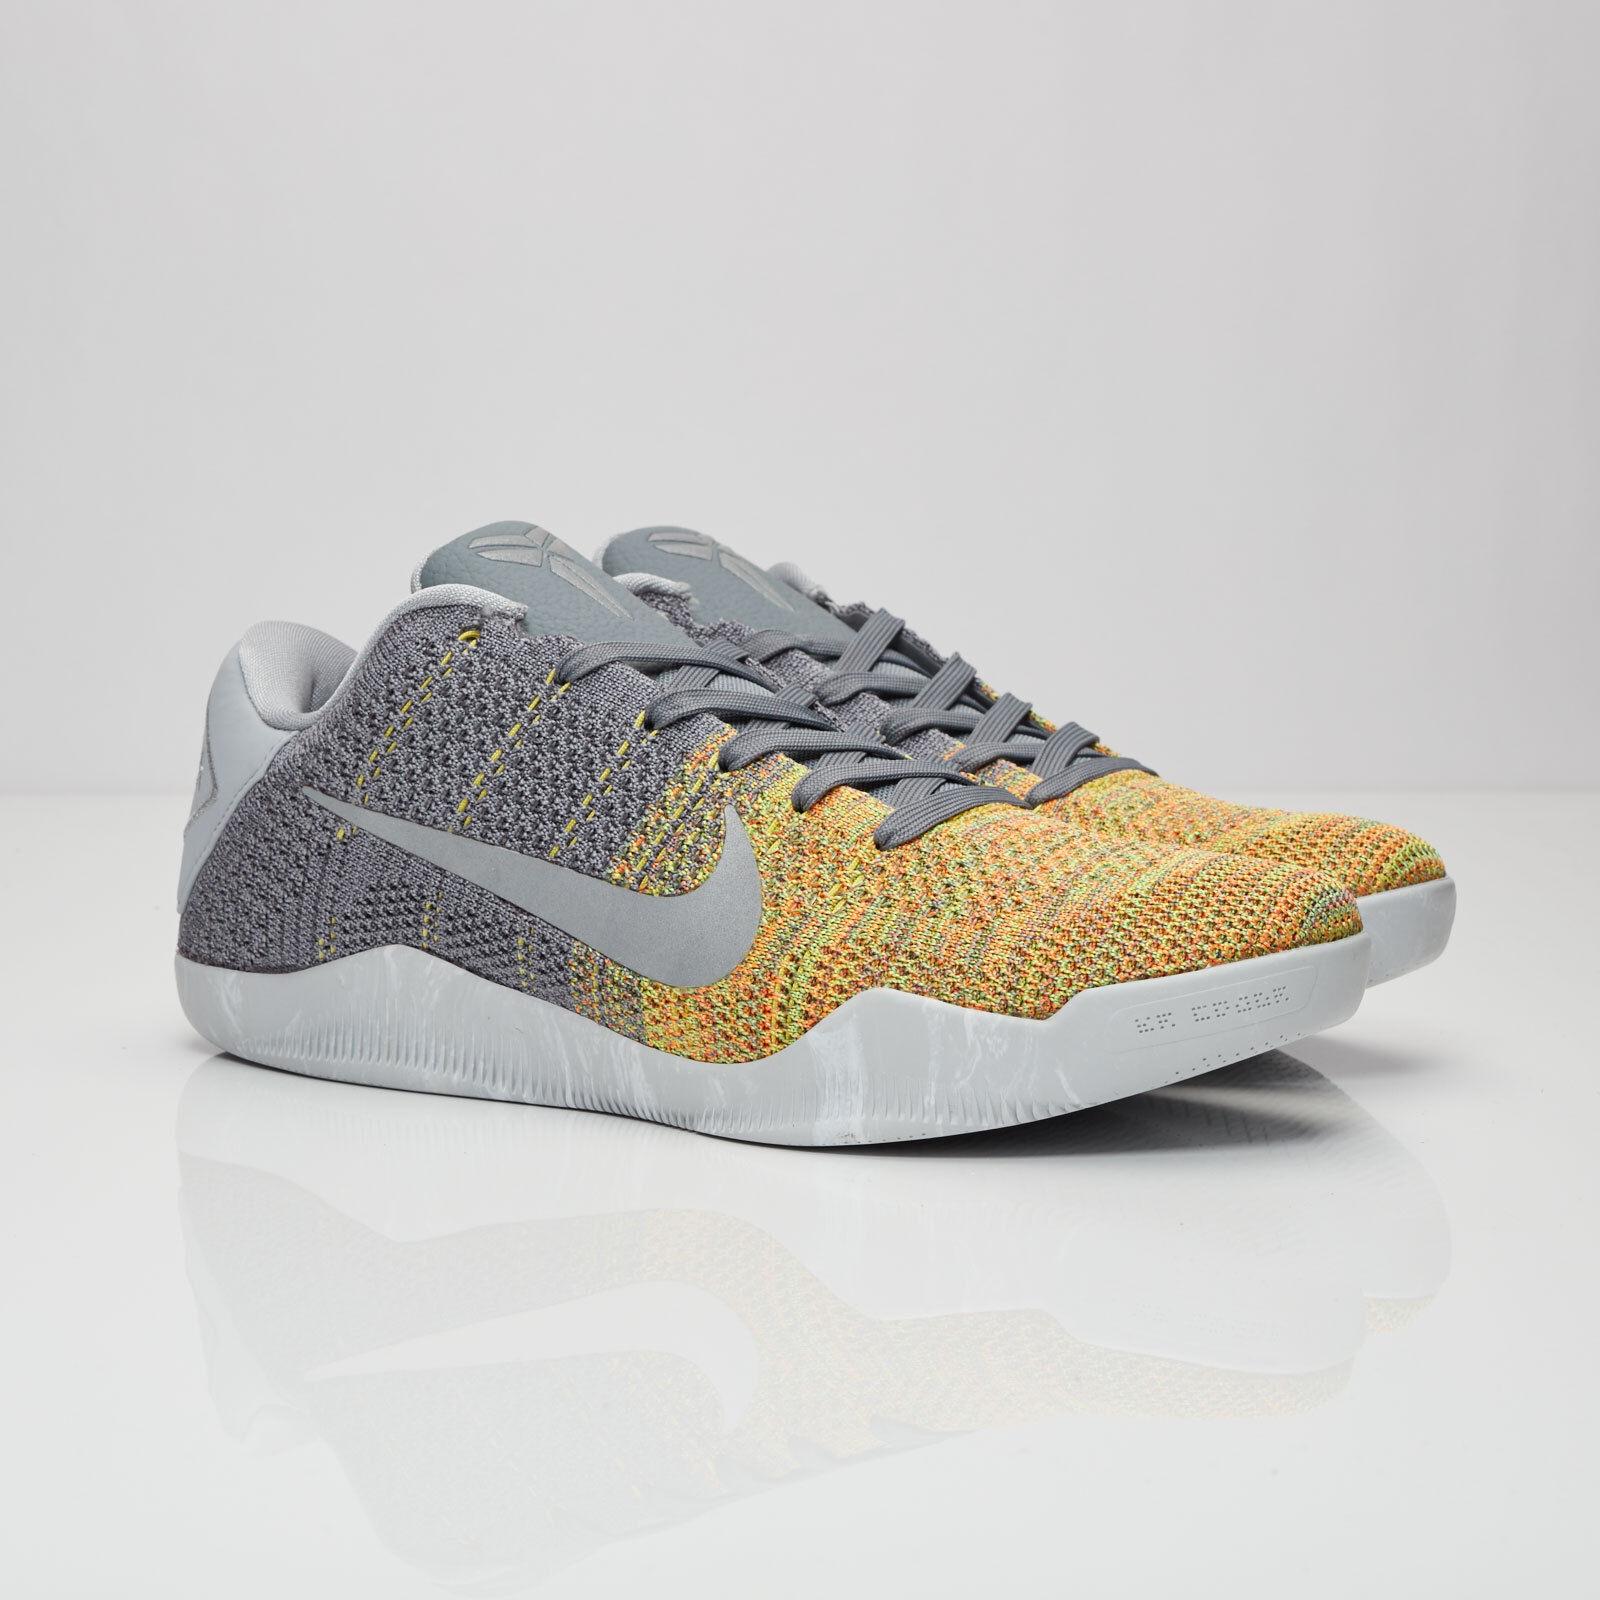 Nike Air Kobe Elite XI Sneakers New Master of Innovation 822675-037 9   9.5